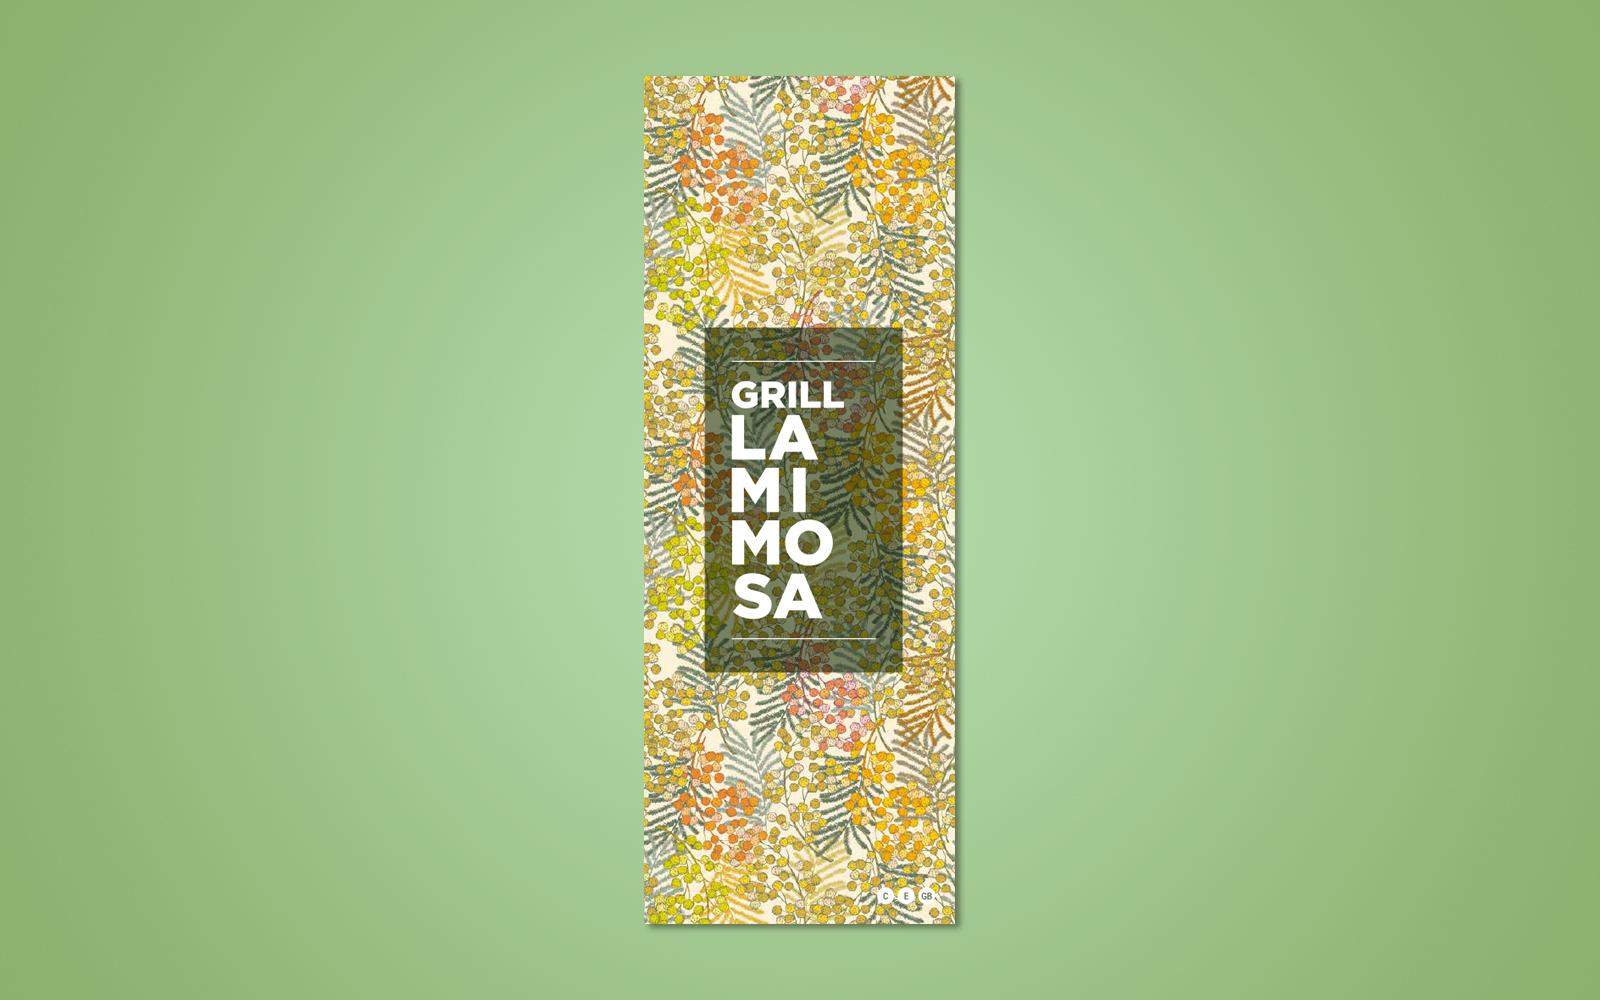 Carta La Mimosa